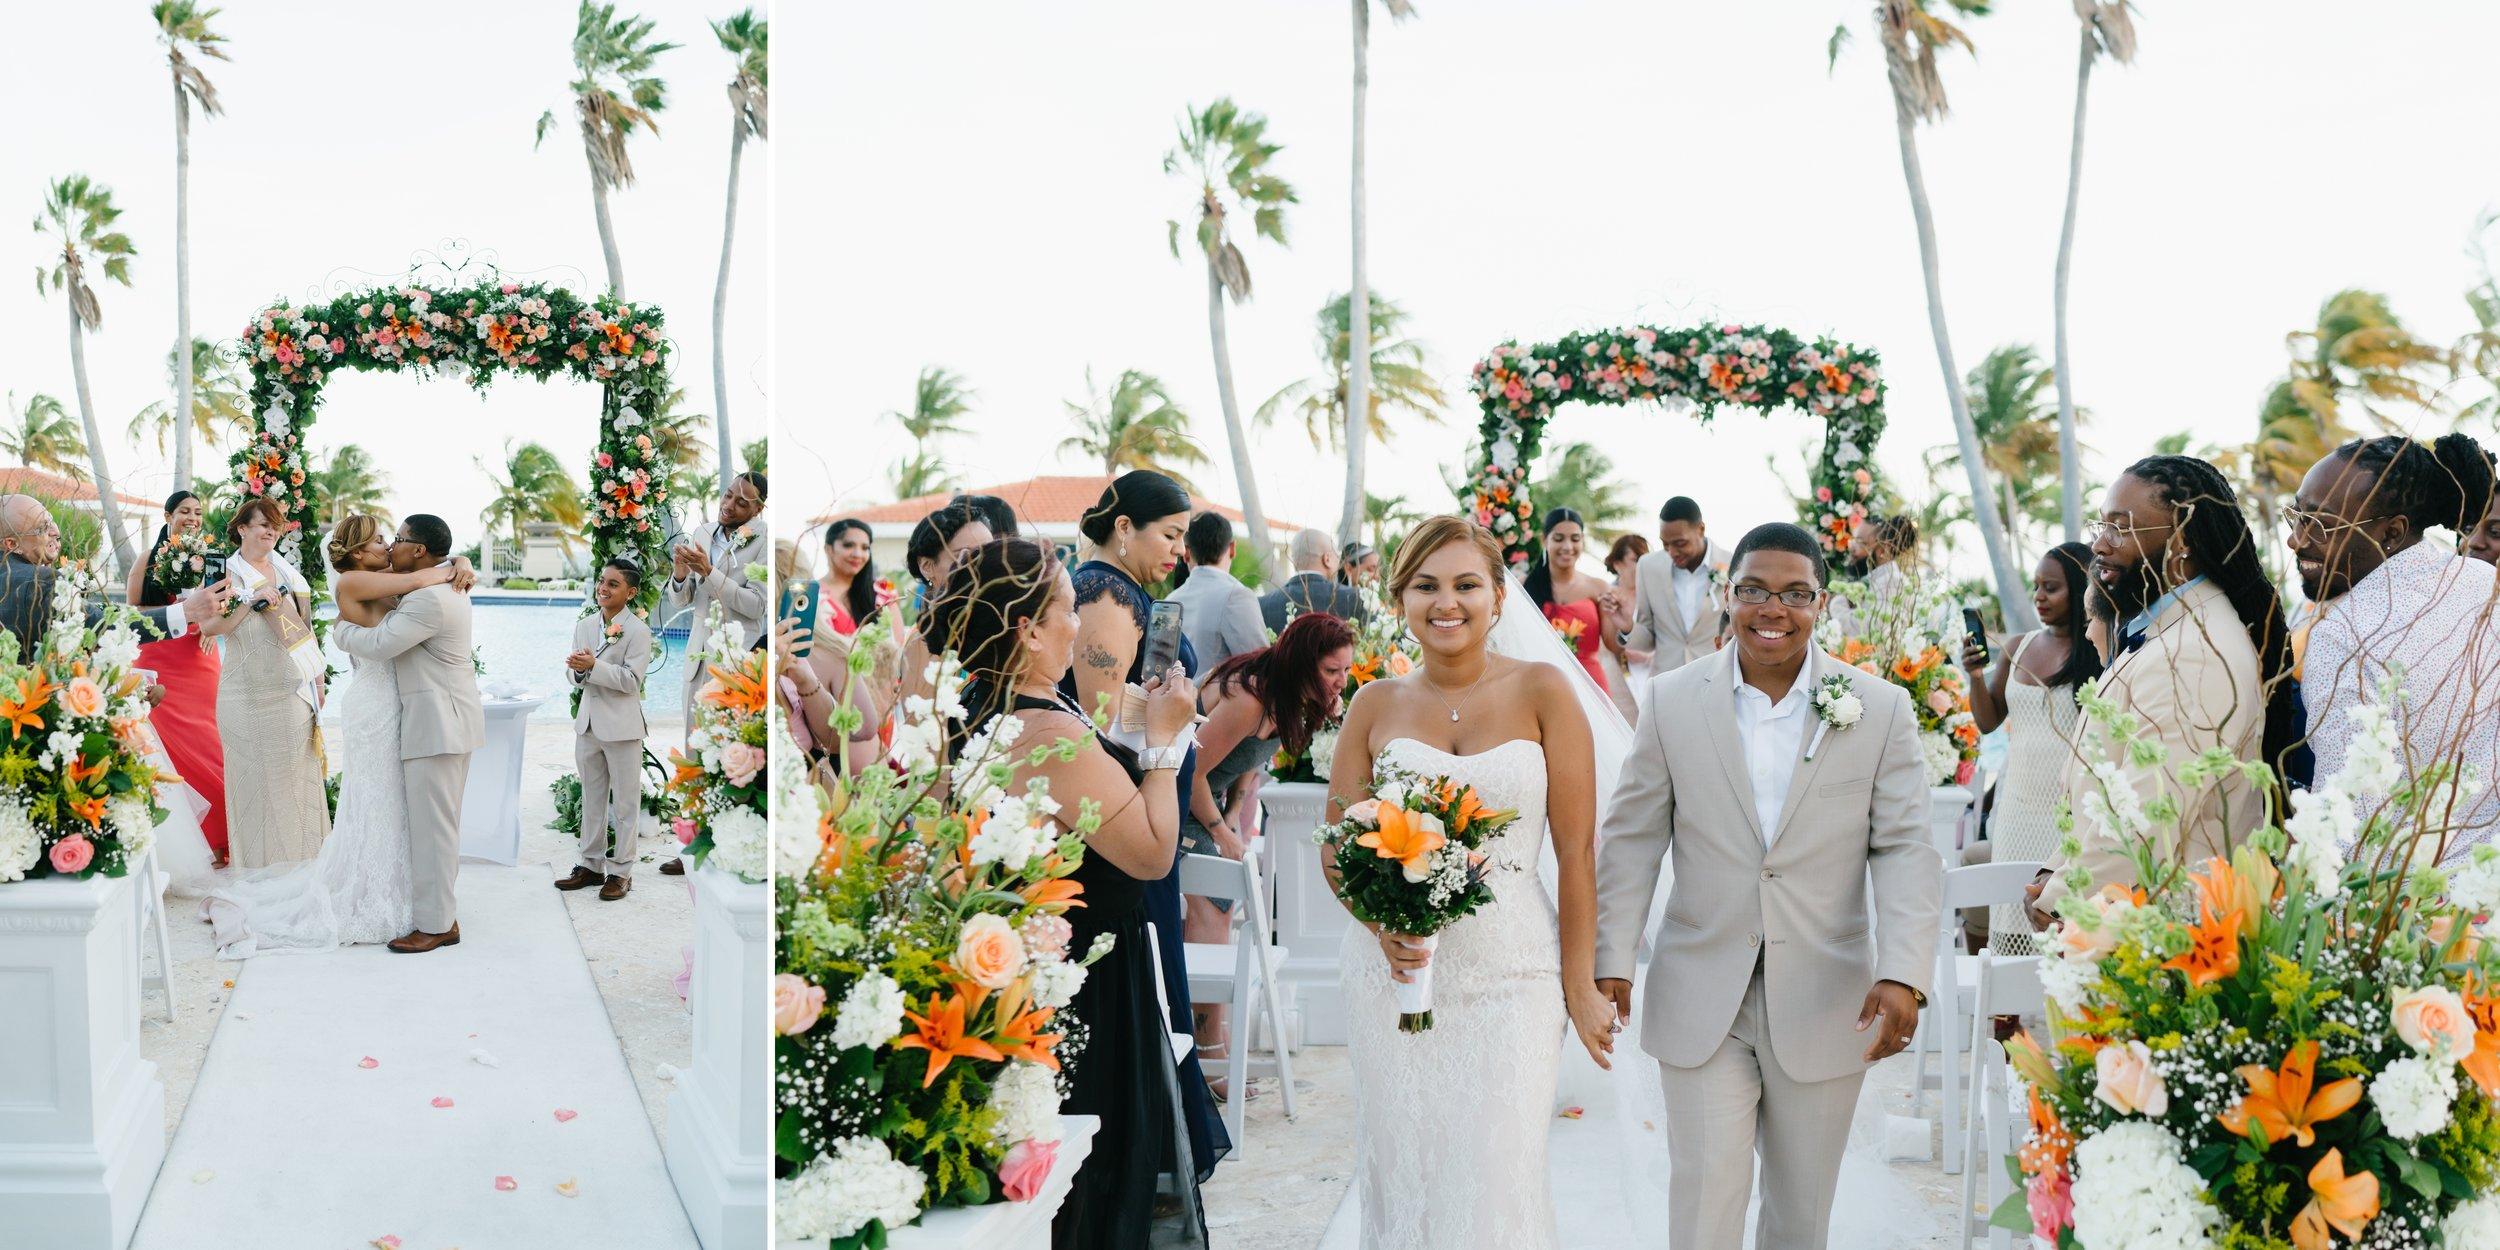 wedding on the beach in Puerto Rico